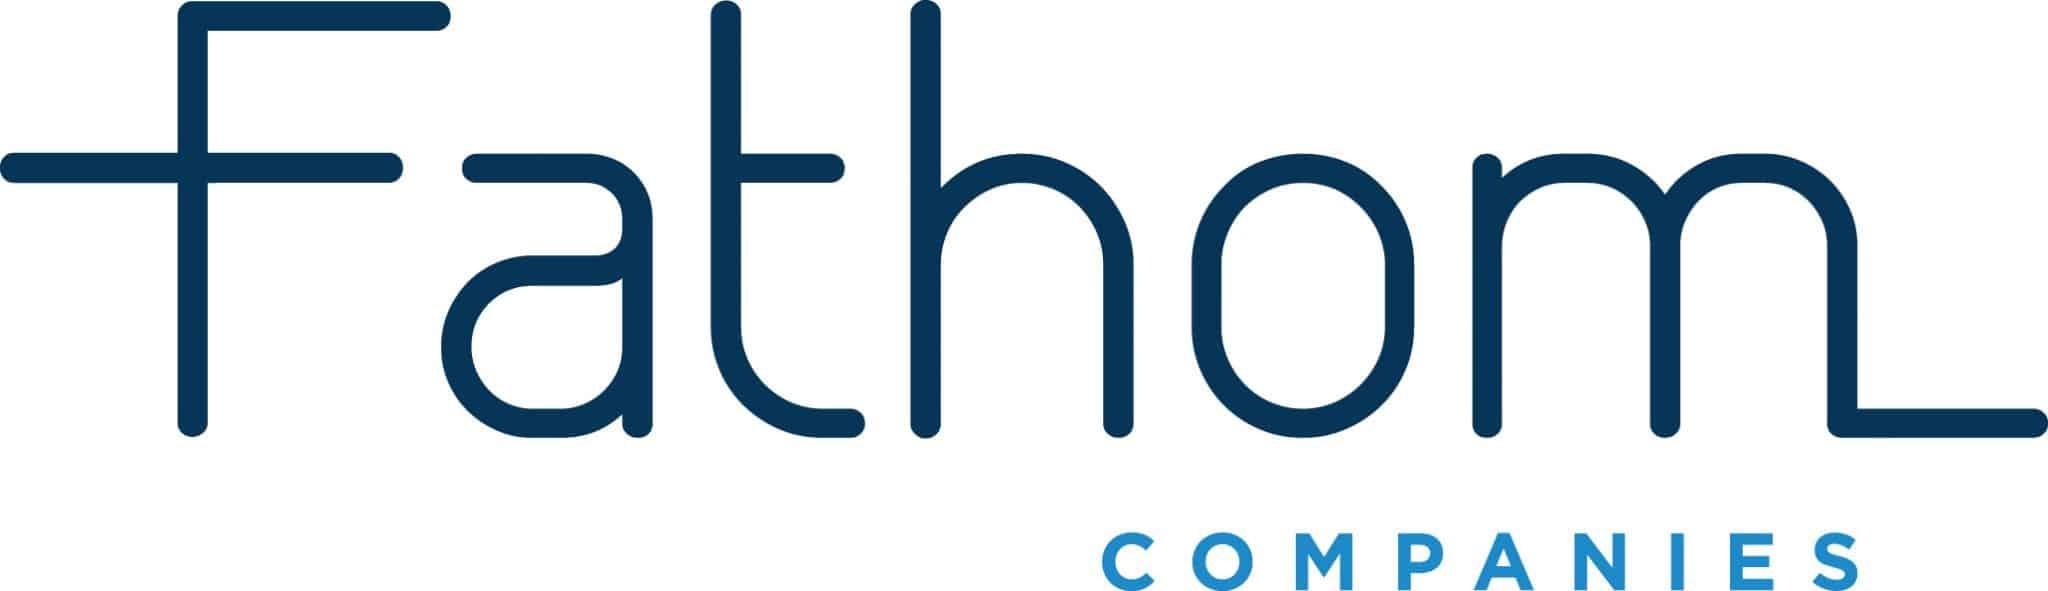 Fathom Companies